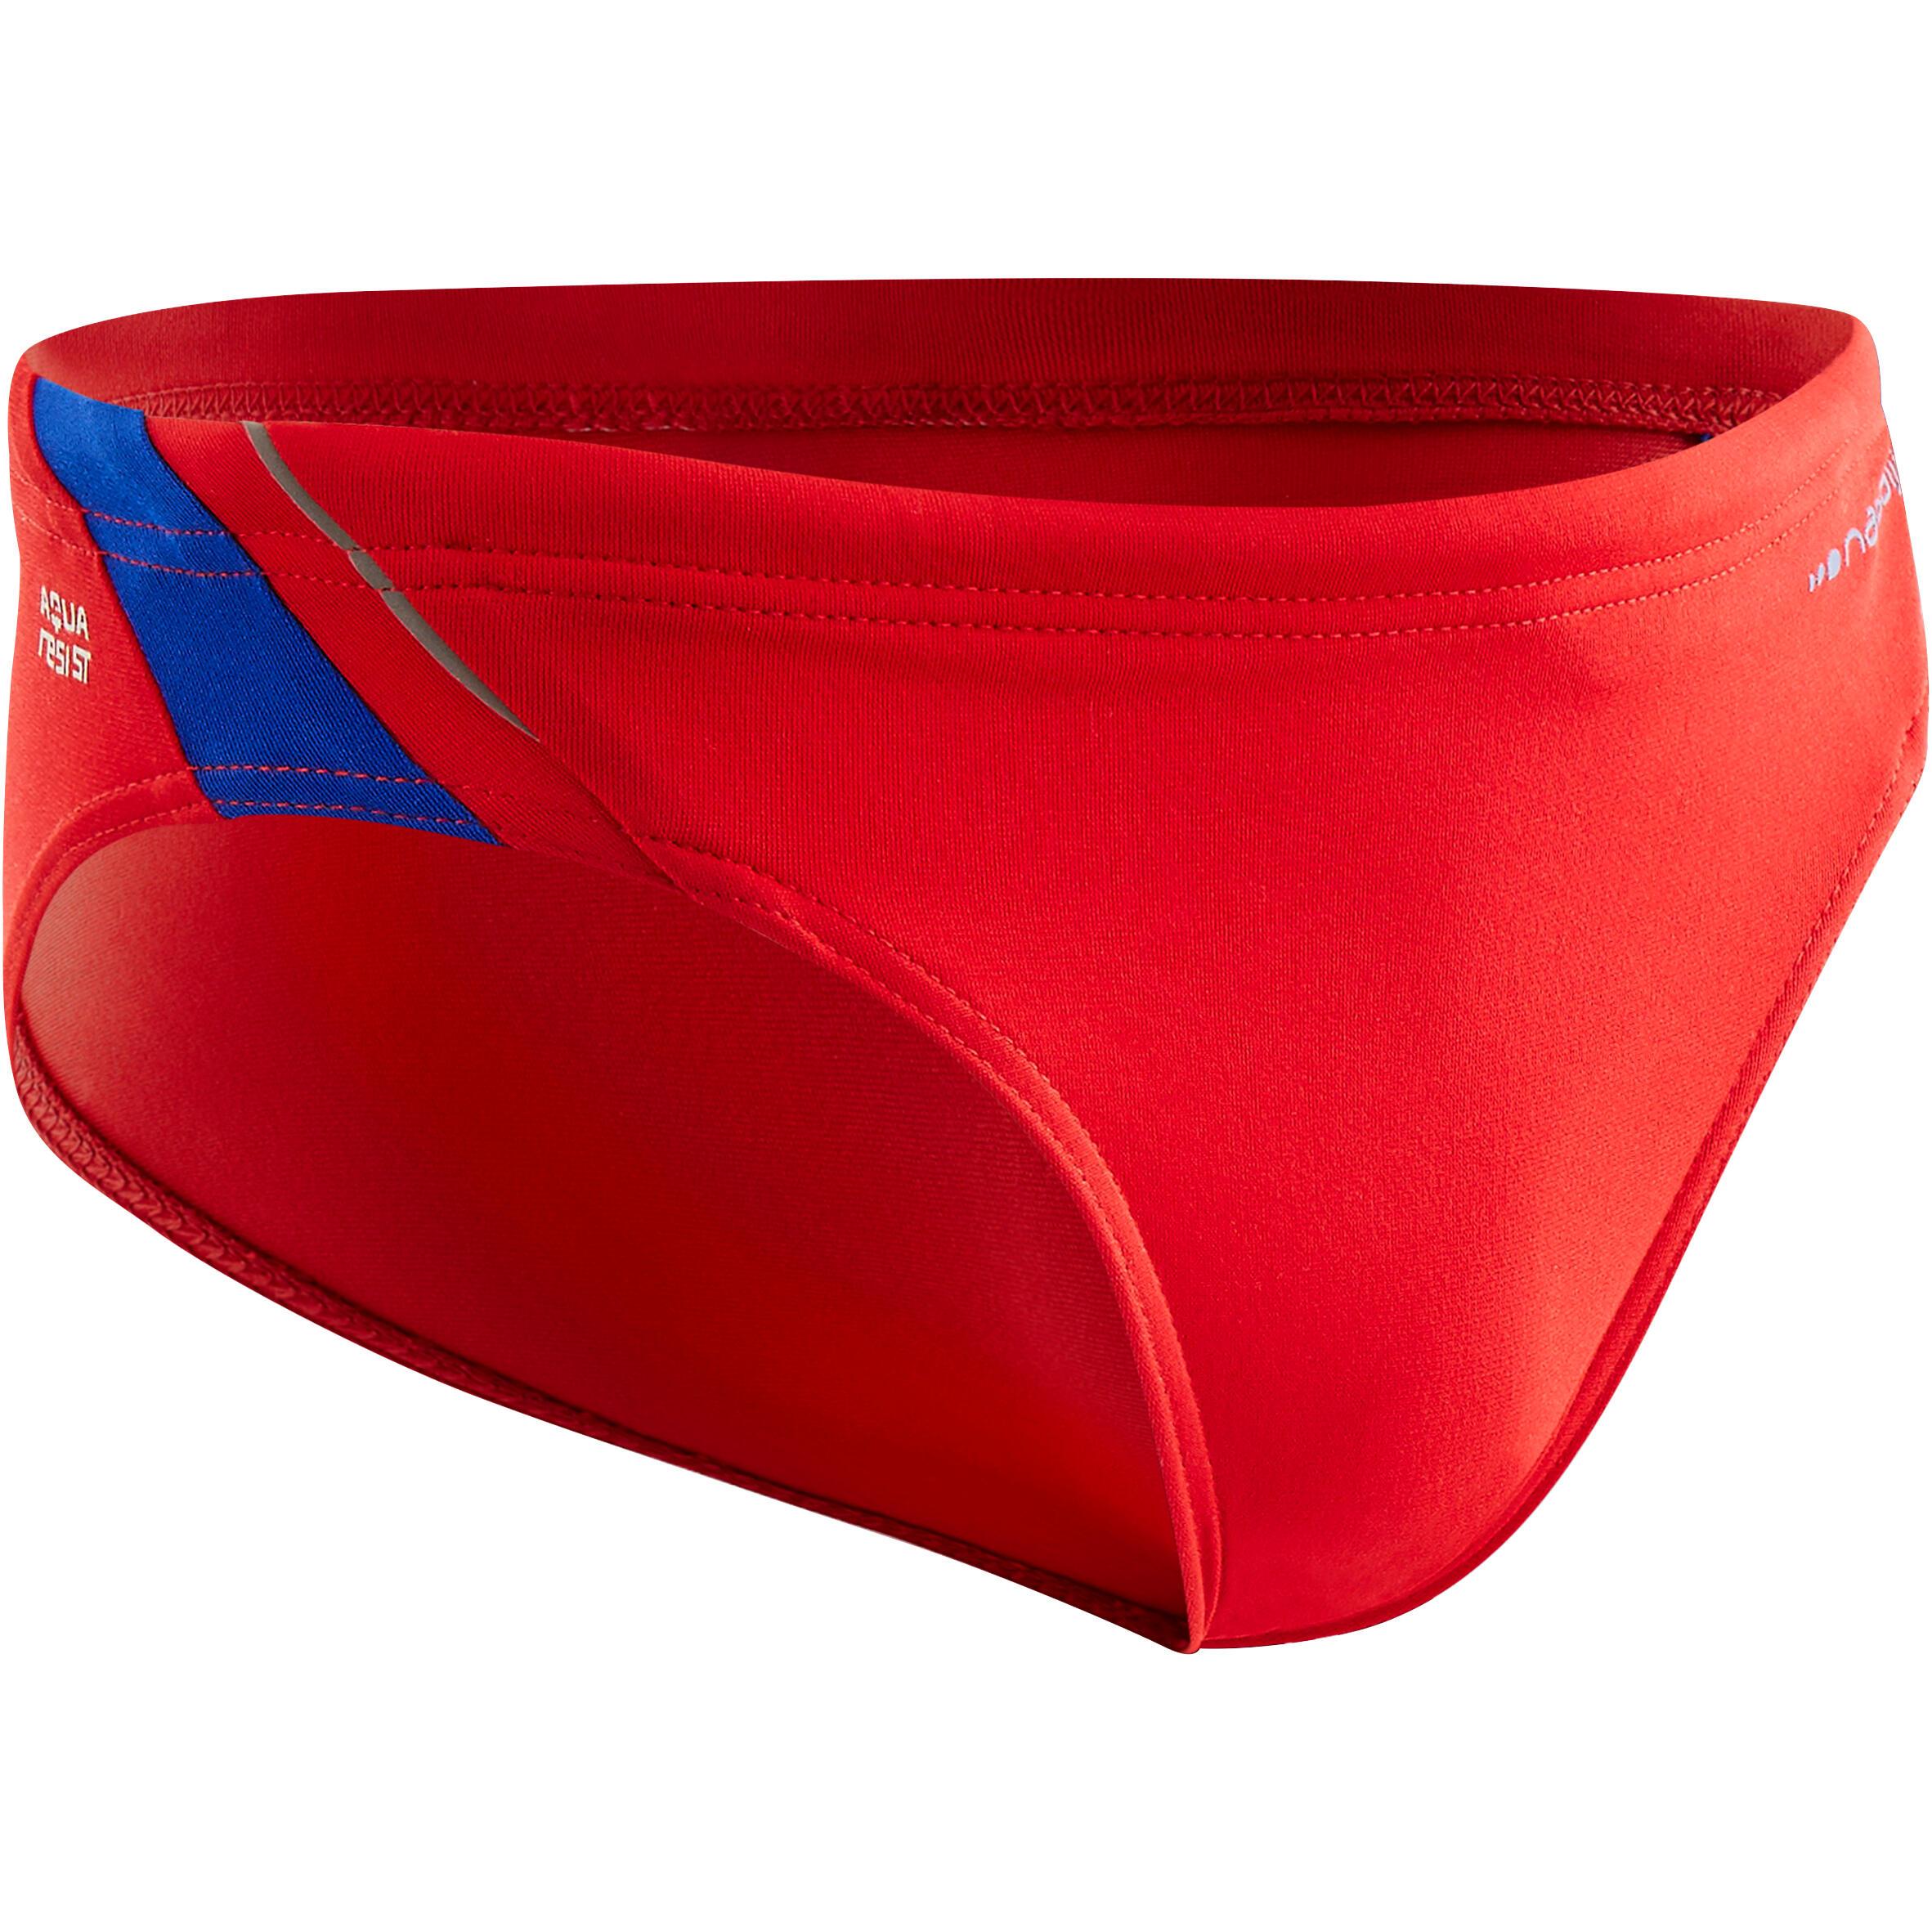 Jungen,Kinder Badehose Slip 900 Yoke B Jungen rot/blau | 03583788142935